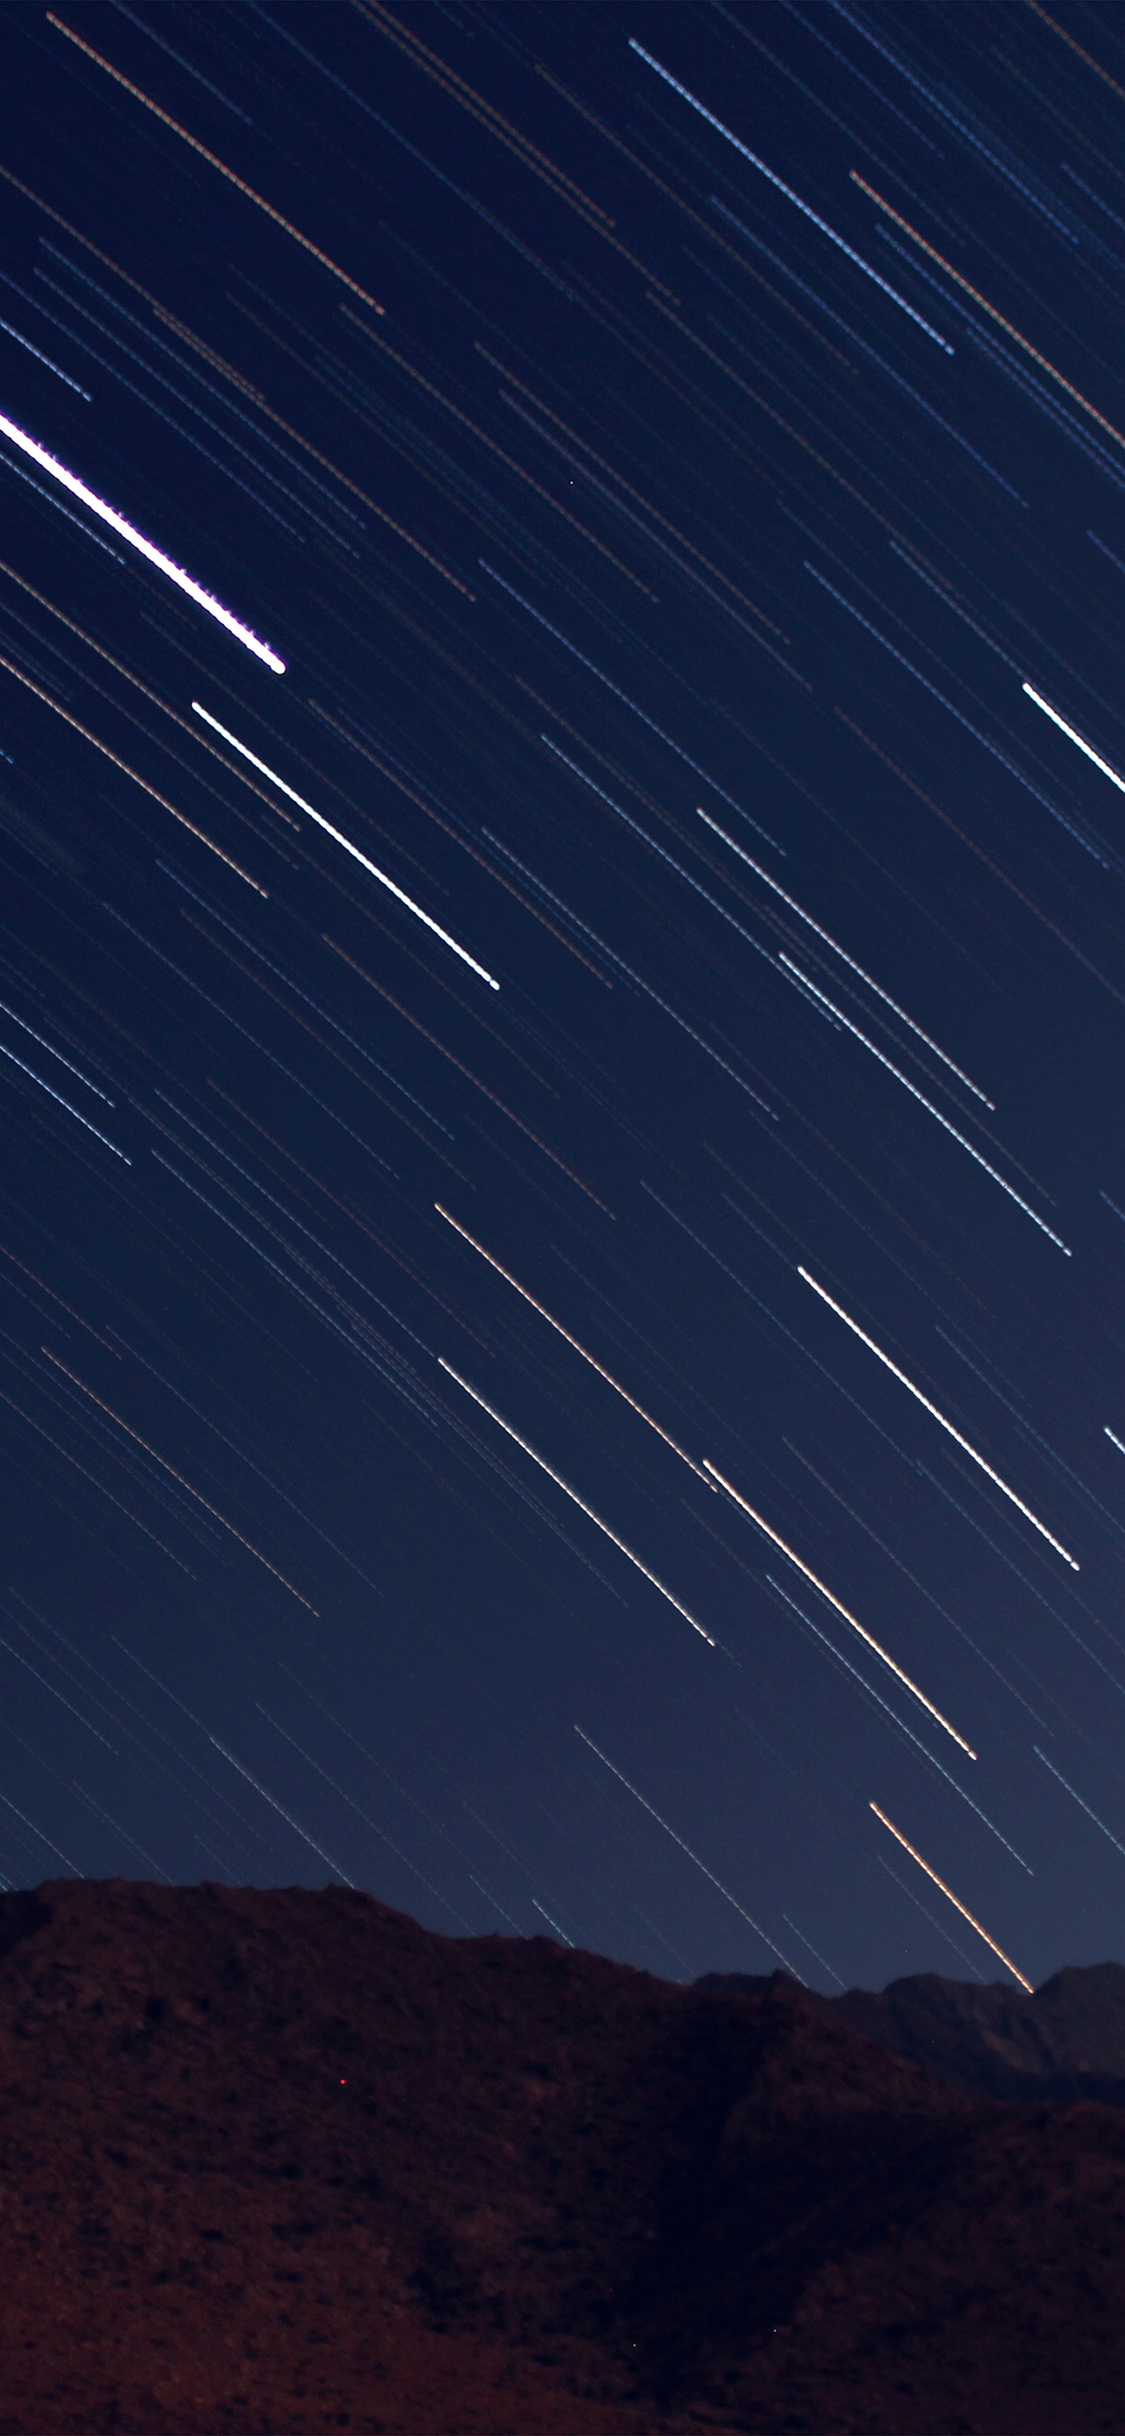 iPhoneXpapers.com-Apple-iPhone-wallpaper-nf21-dark-night-sky-star-nature